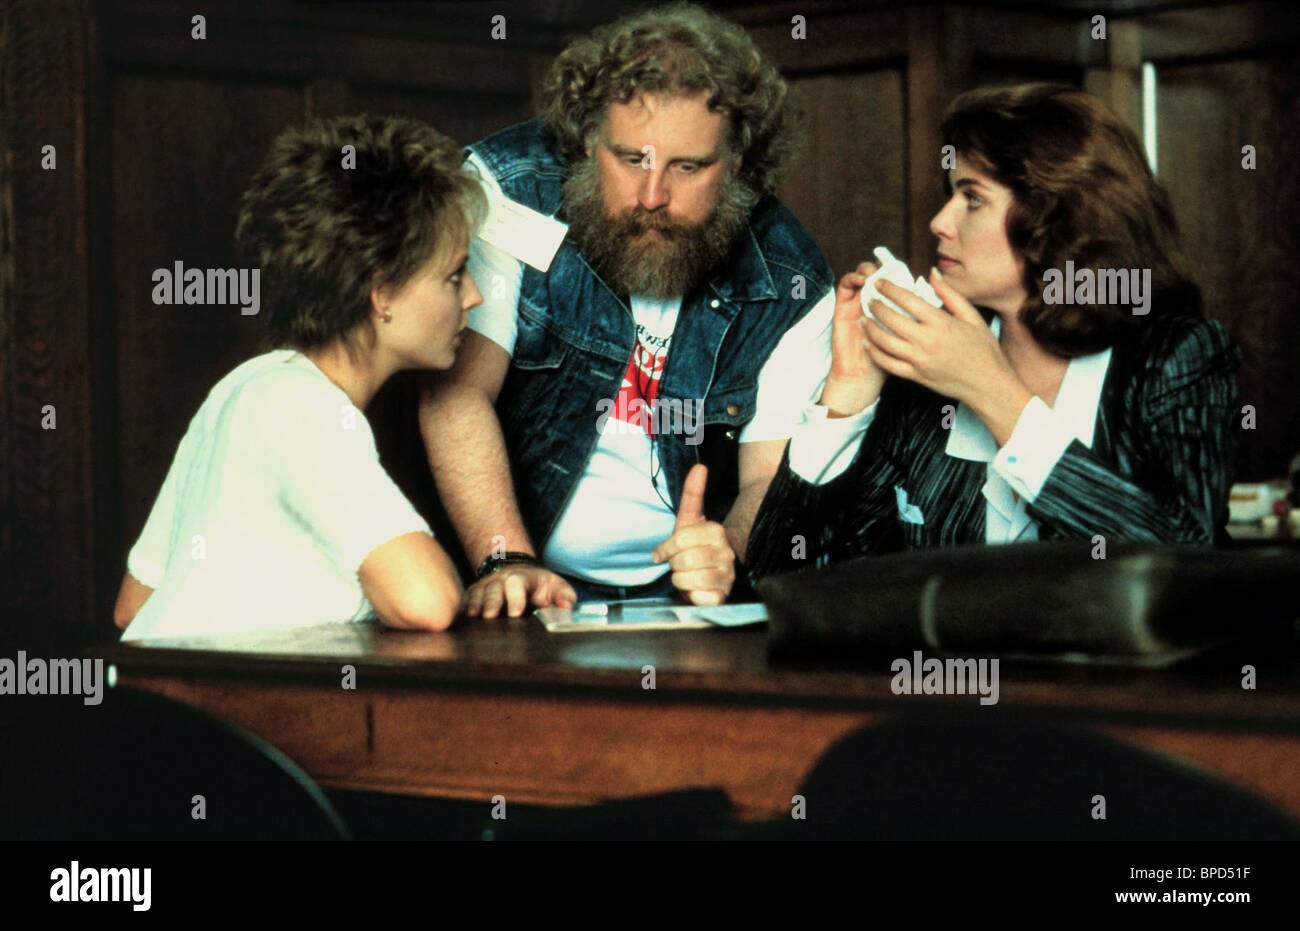 JODIE FOSTER JONATHAN KAPLAN KELLY MCGILLIS THE ACCUSED (1988) - Stock Image